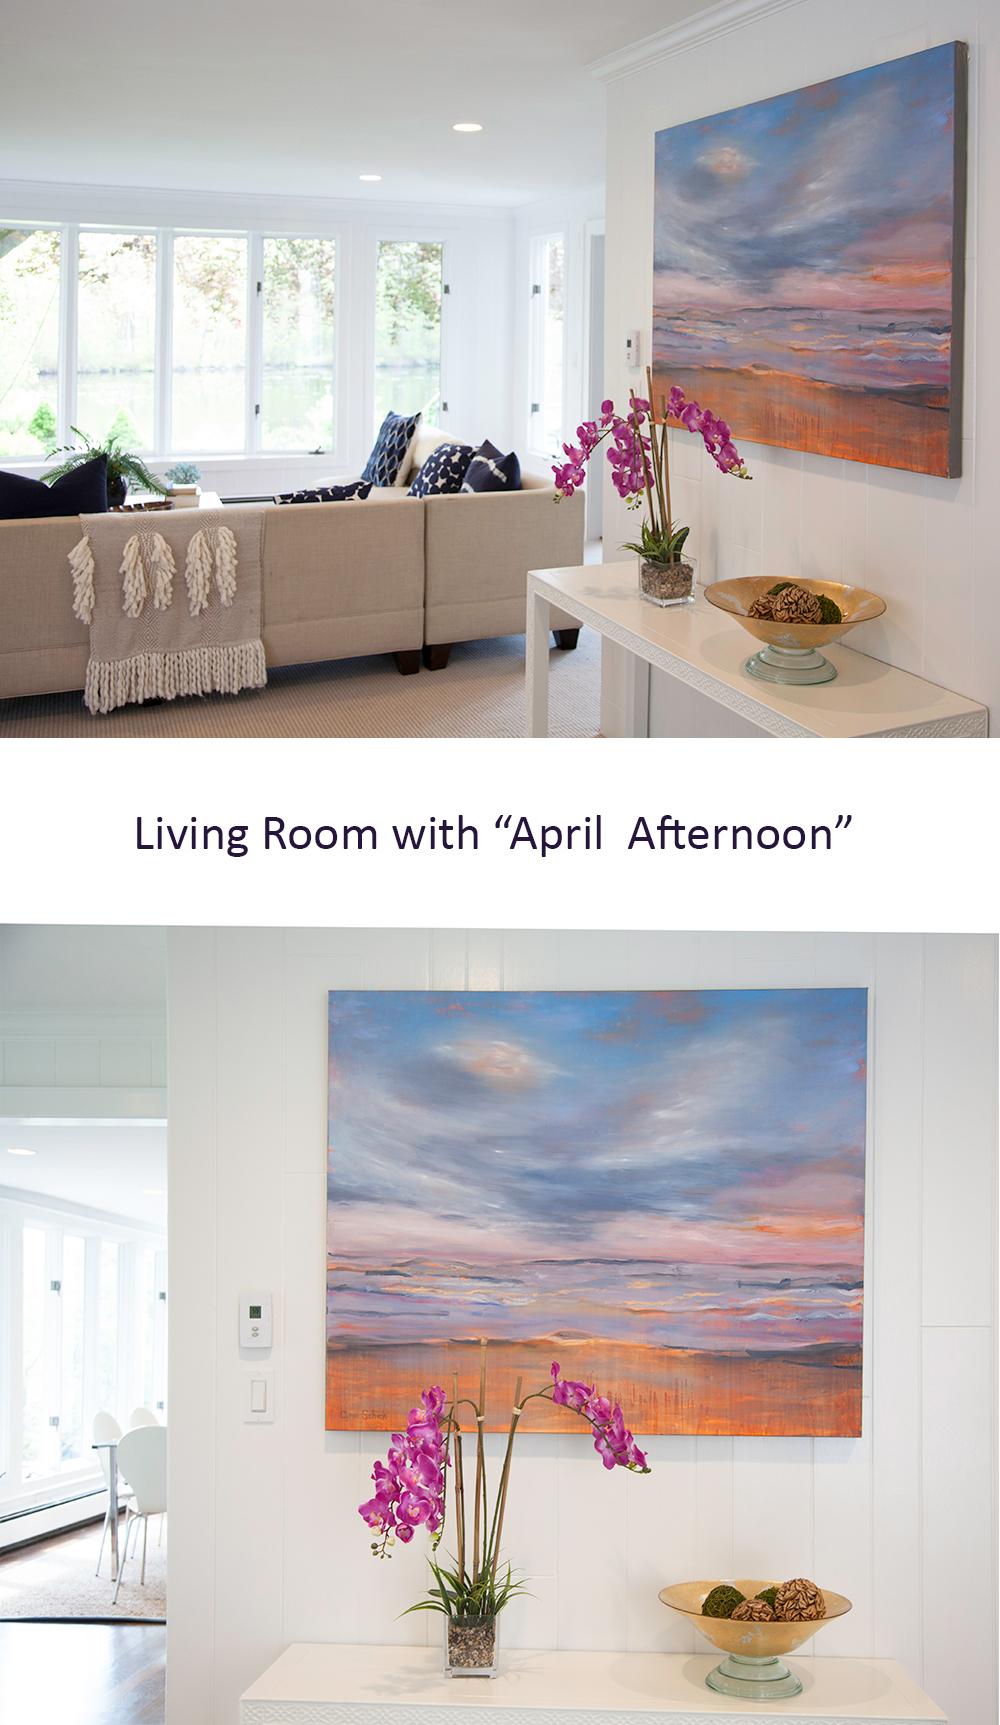 April afternoon - ideas.jpg